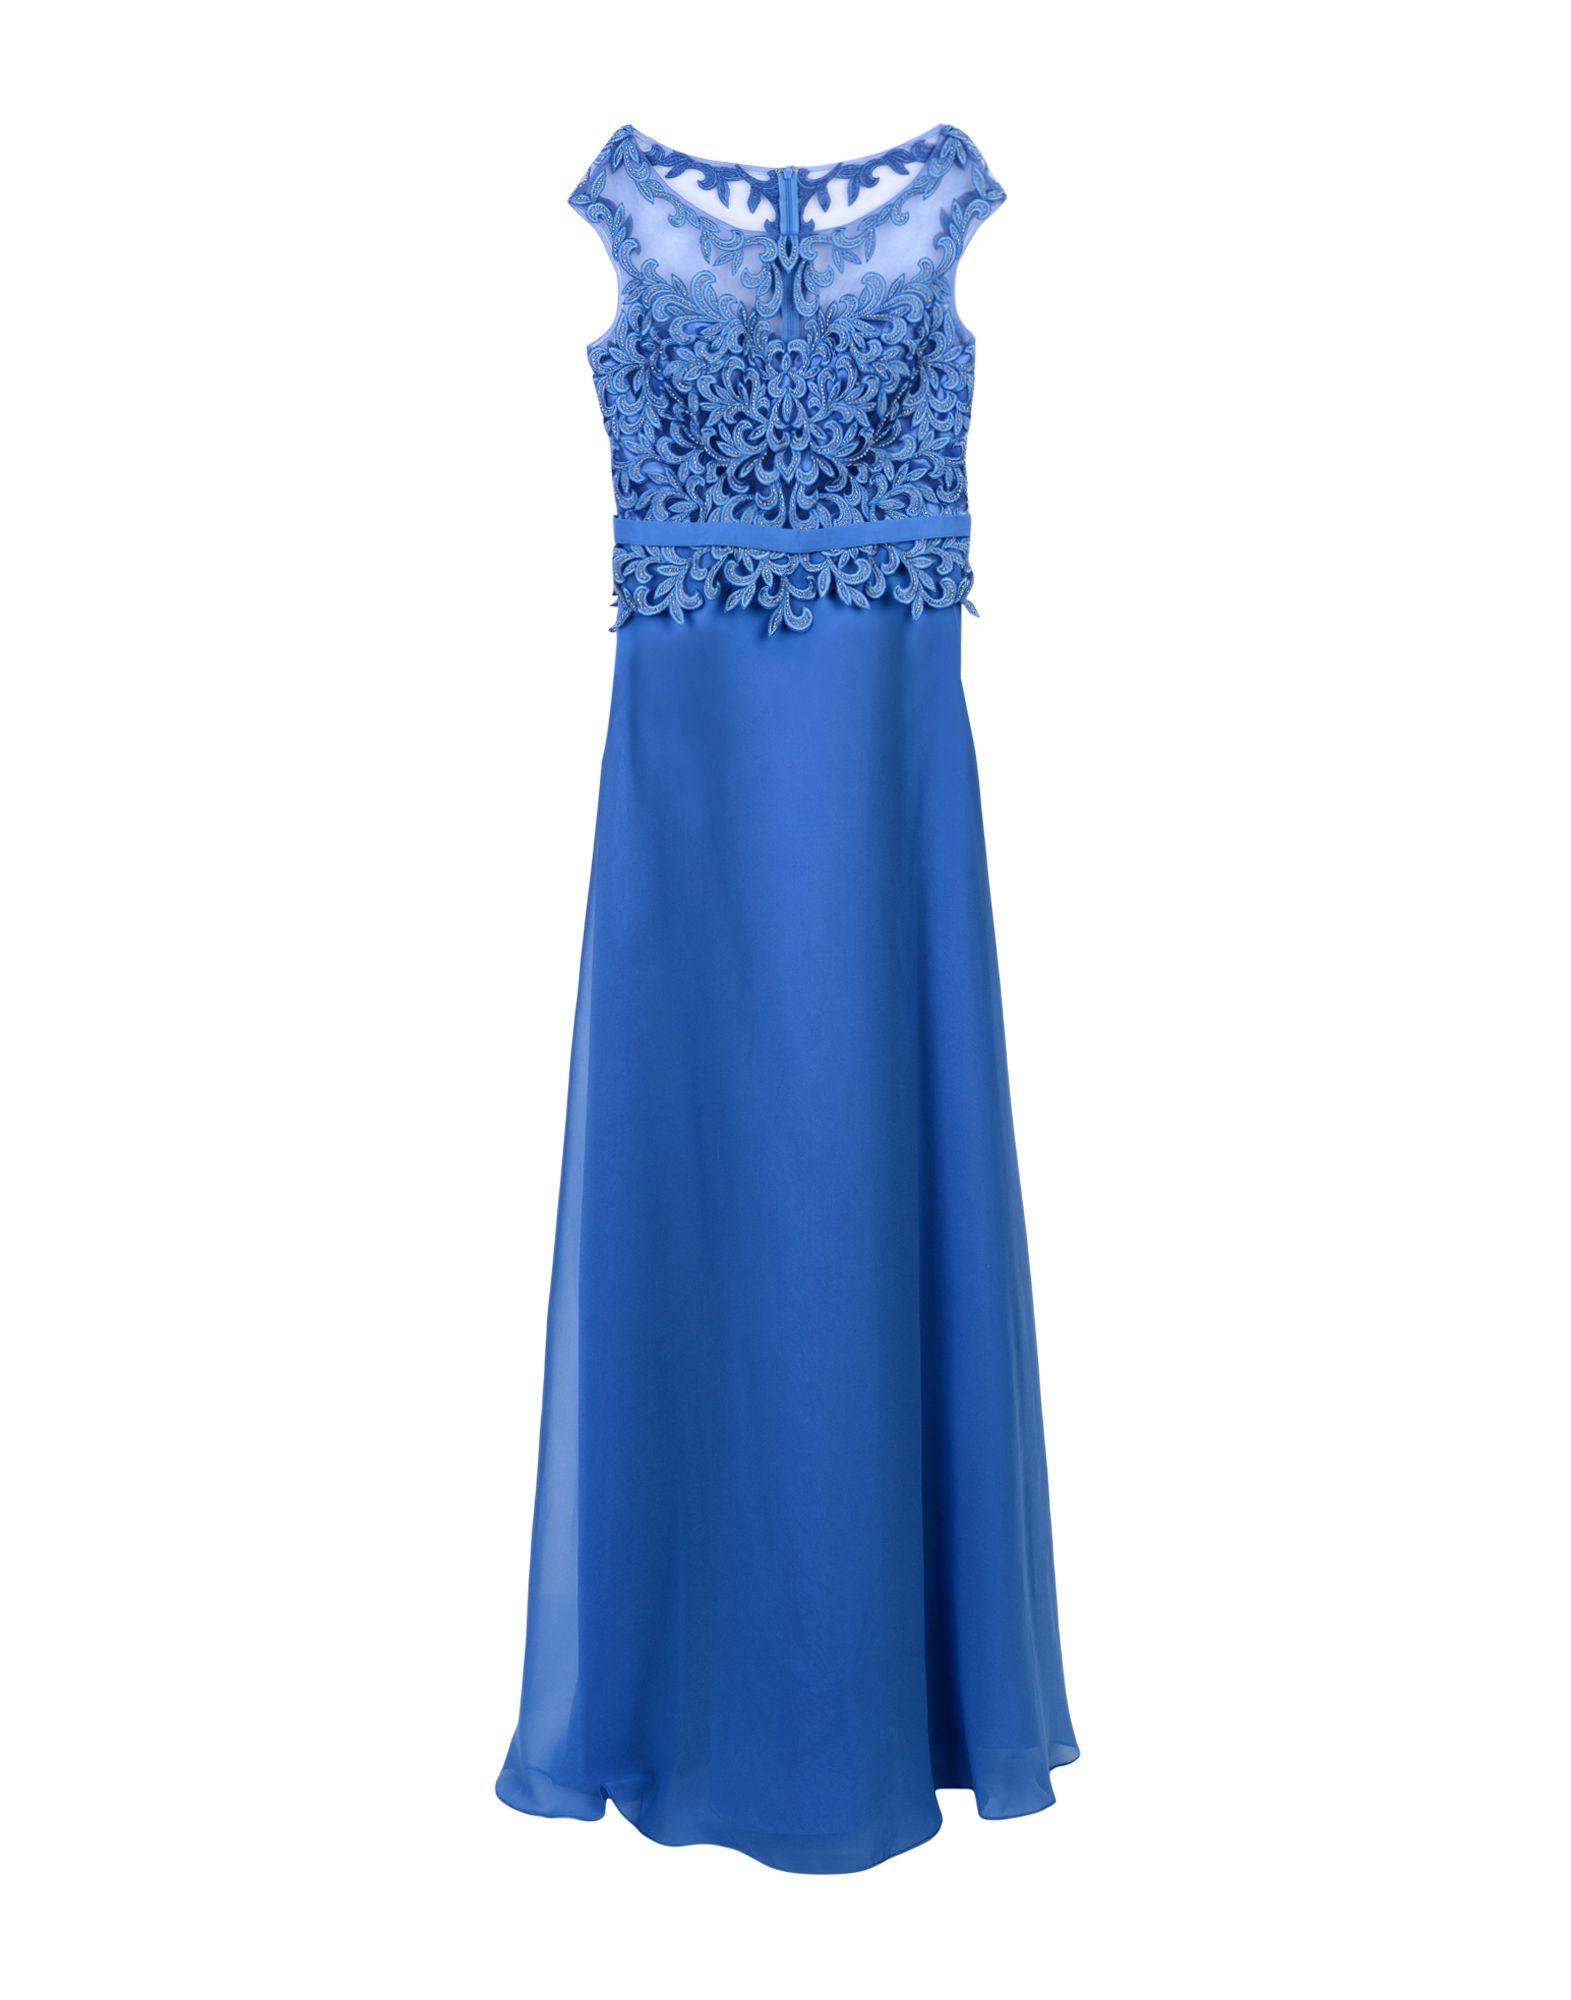 MIKAEL - Γυναικεία Φορέματα  636ae6ab56e